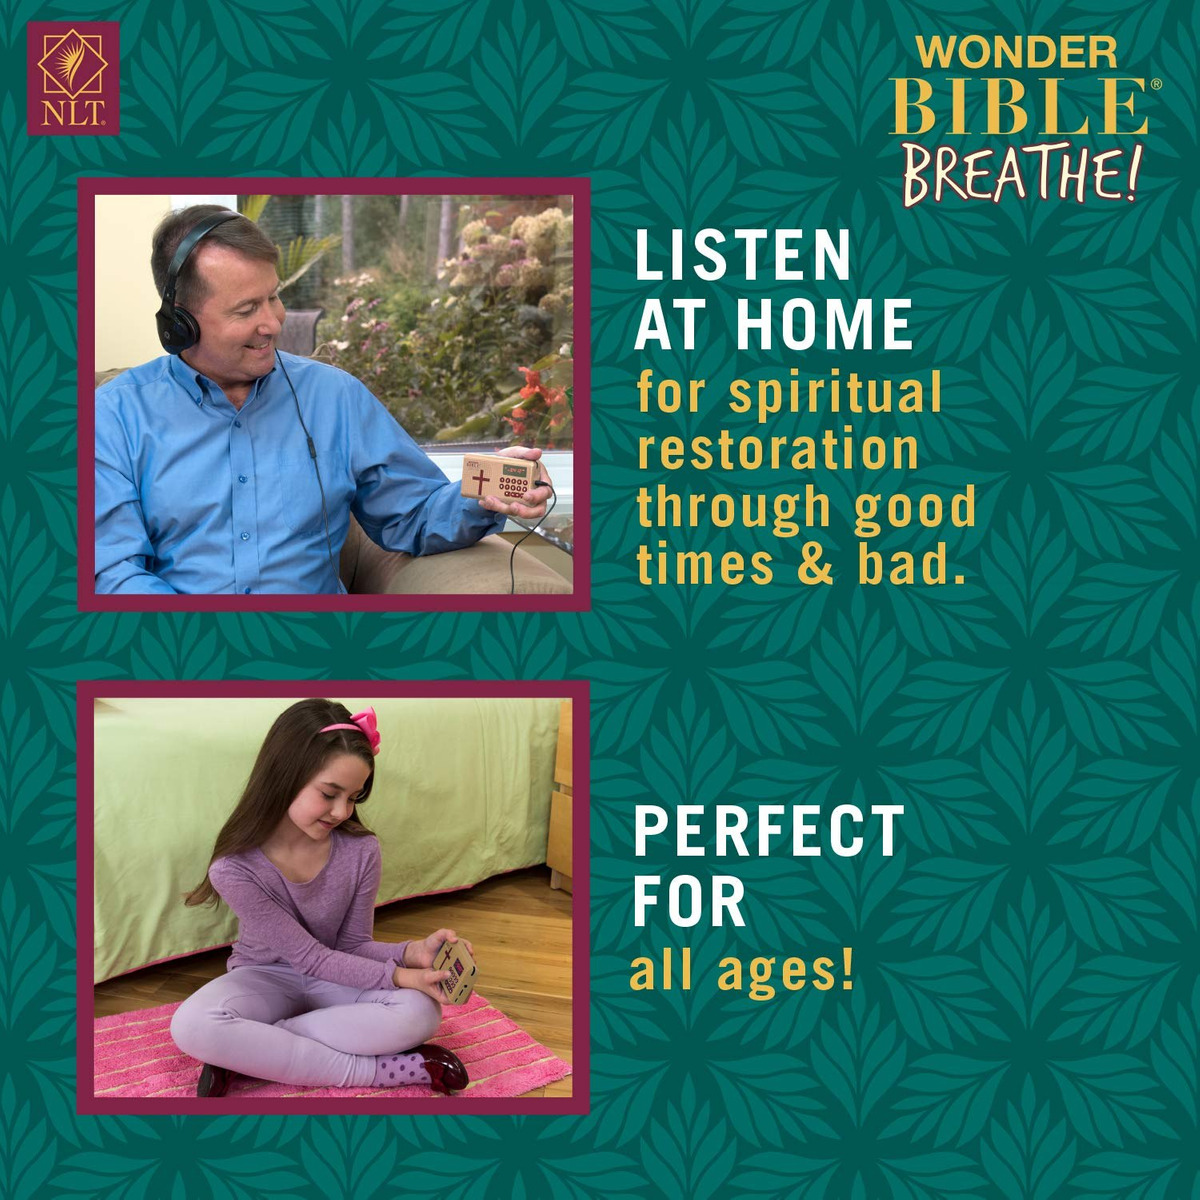 Wonder Bible Breathe Nlt- The Talking Audio Bible Player